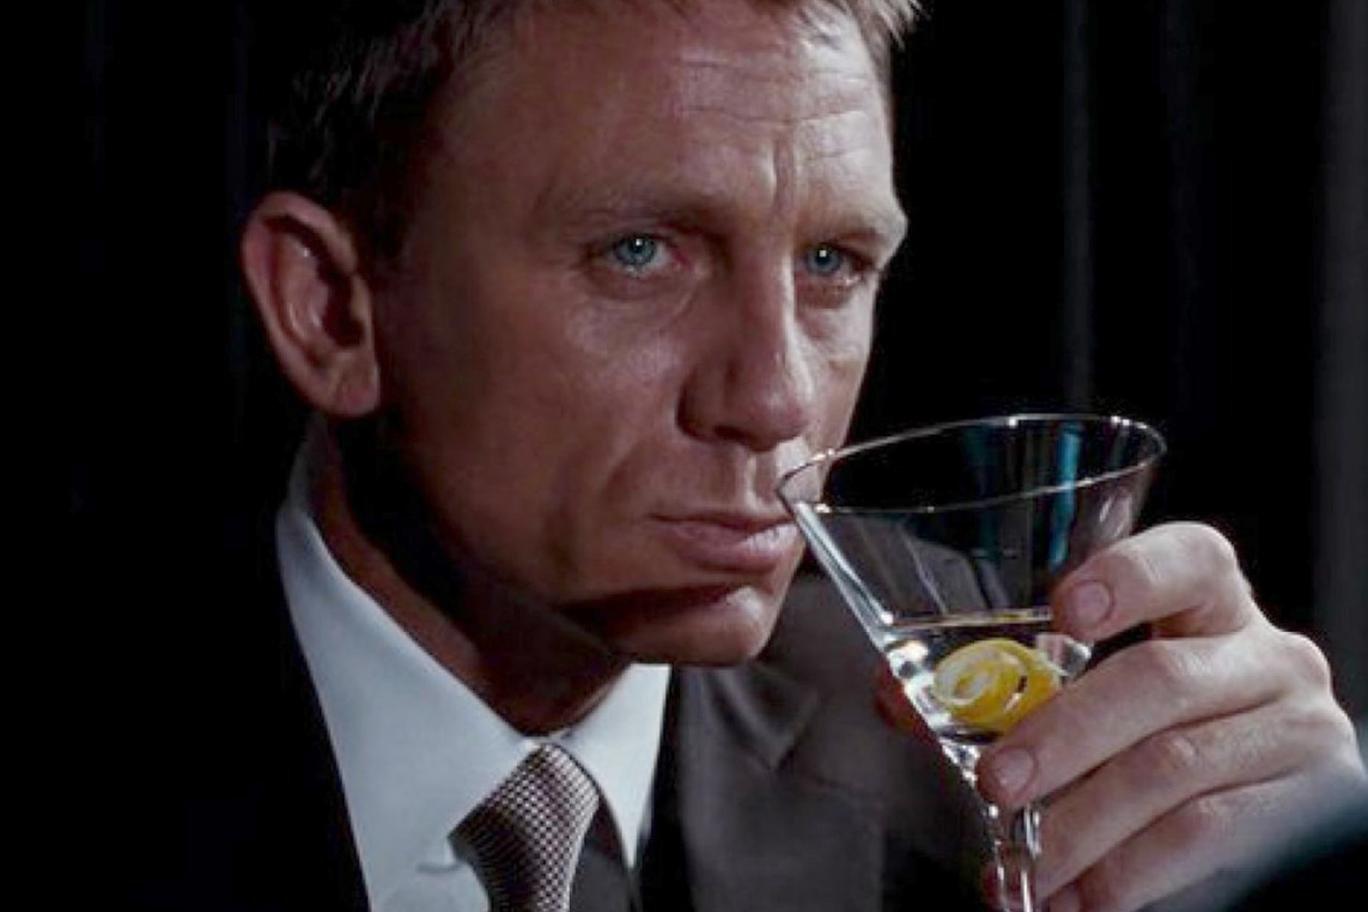 Bond 25: Release date for Daniel Craig's 'last film as James Bond' pushed back…again